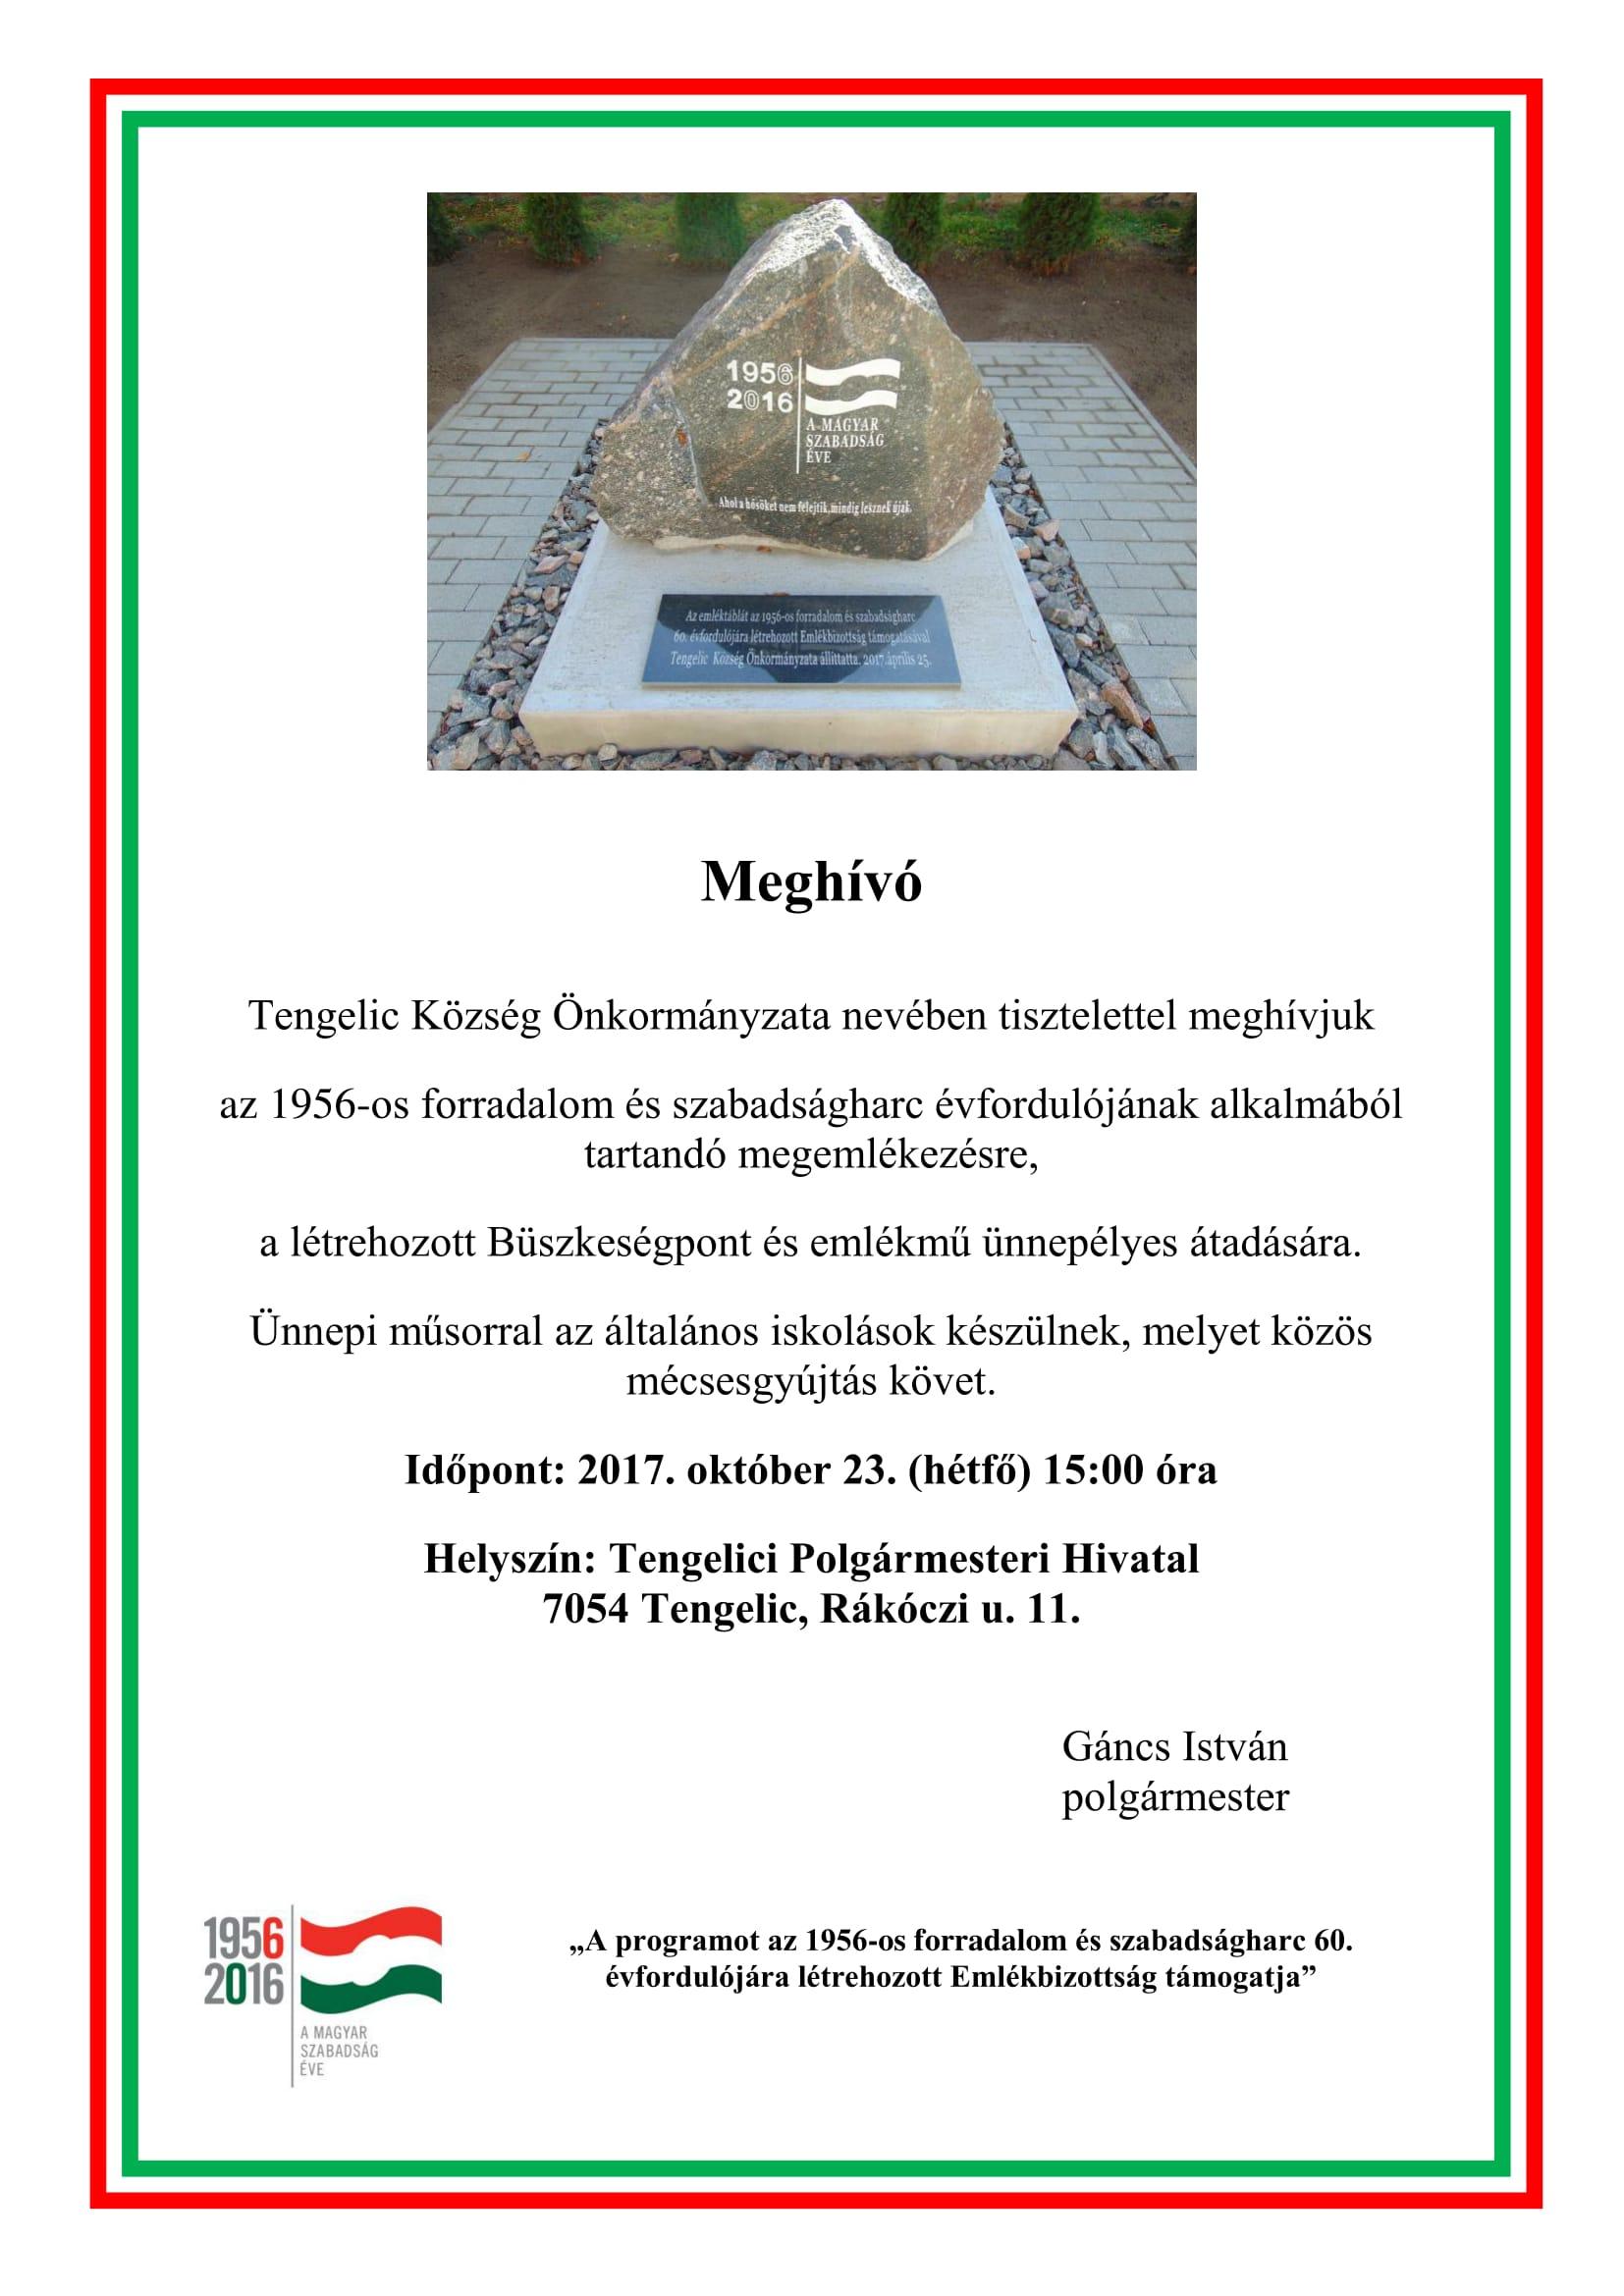 Meghivo-56-os-unnepseg